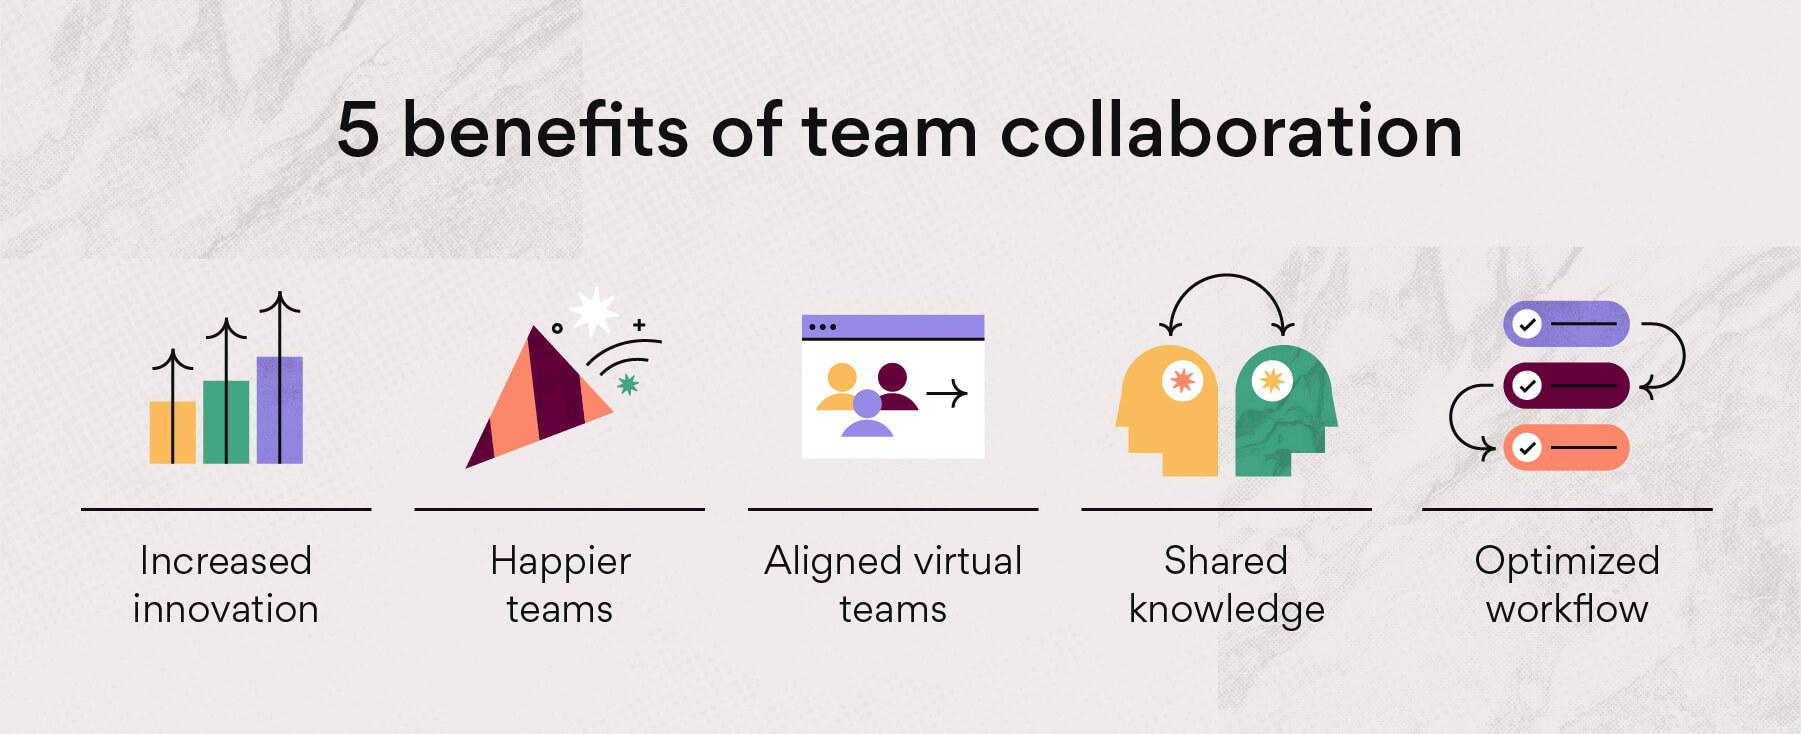 5 benefits of team collaboration